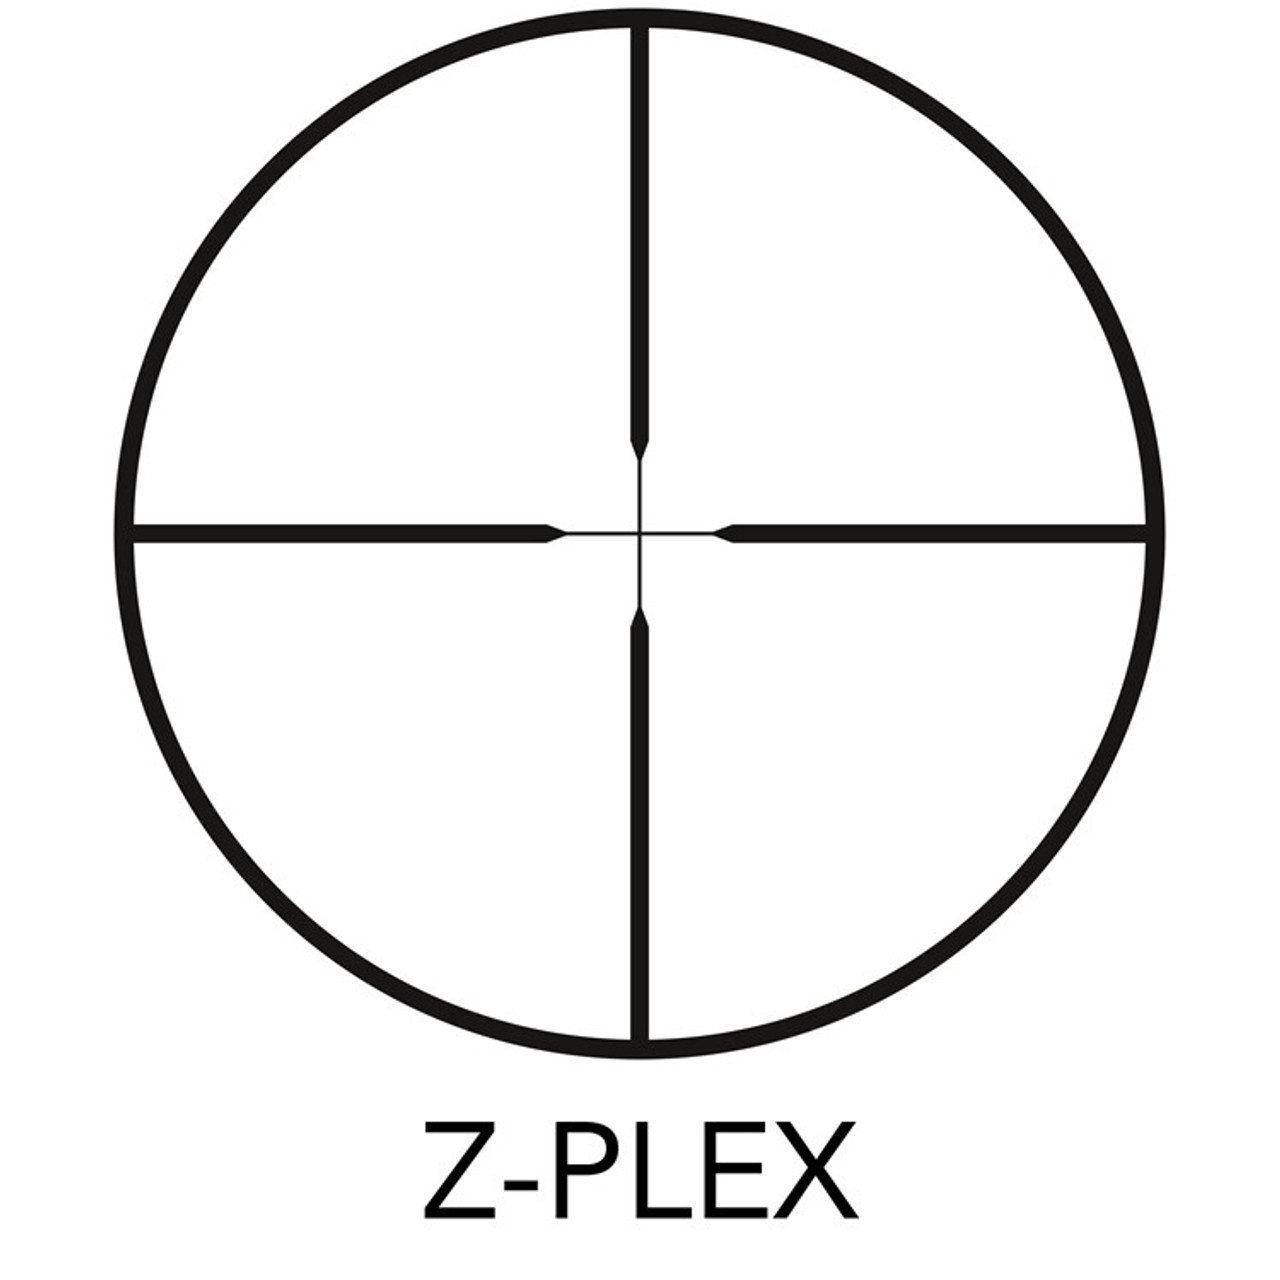 Conquest V4 4-16x44 Z-Plex Riflescope by ZEISS